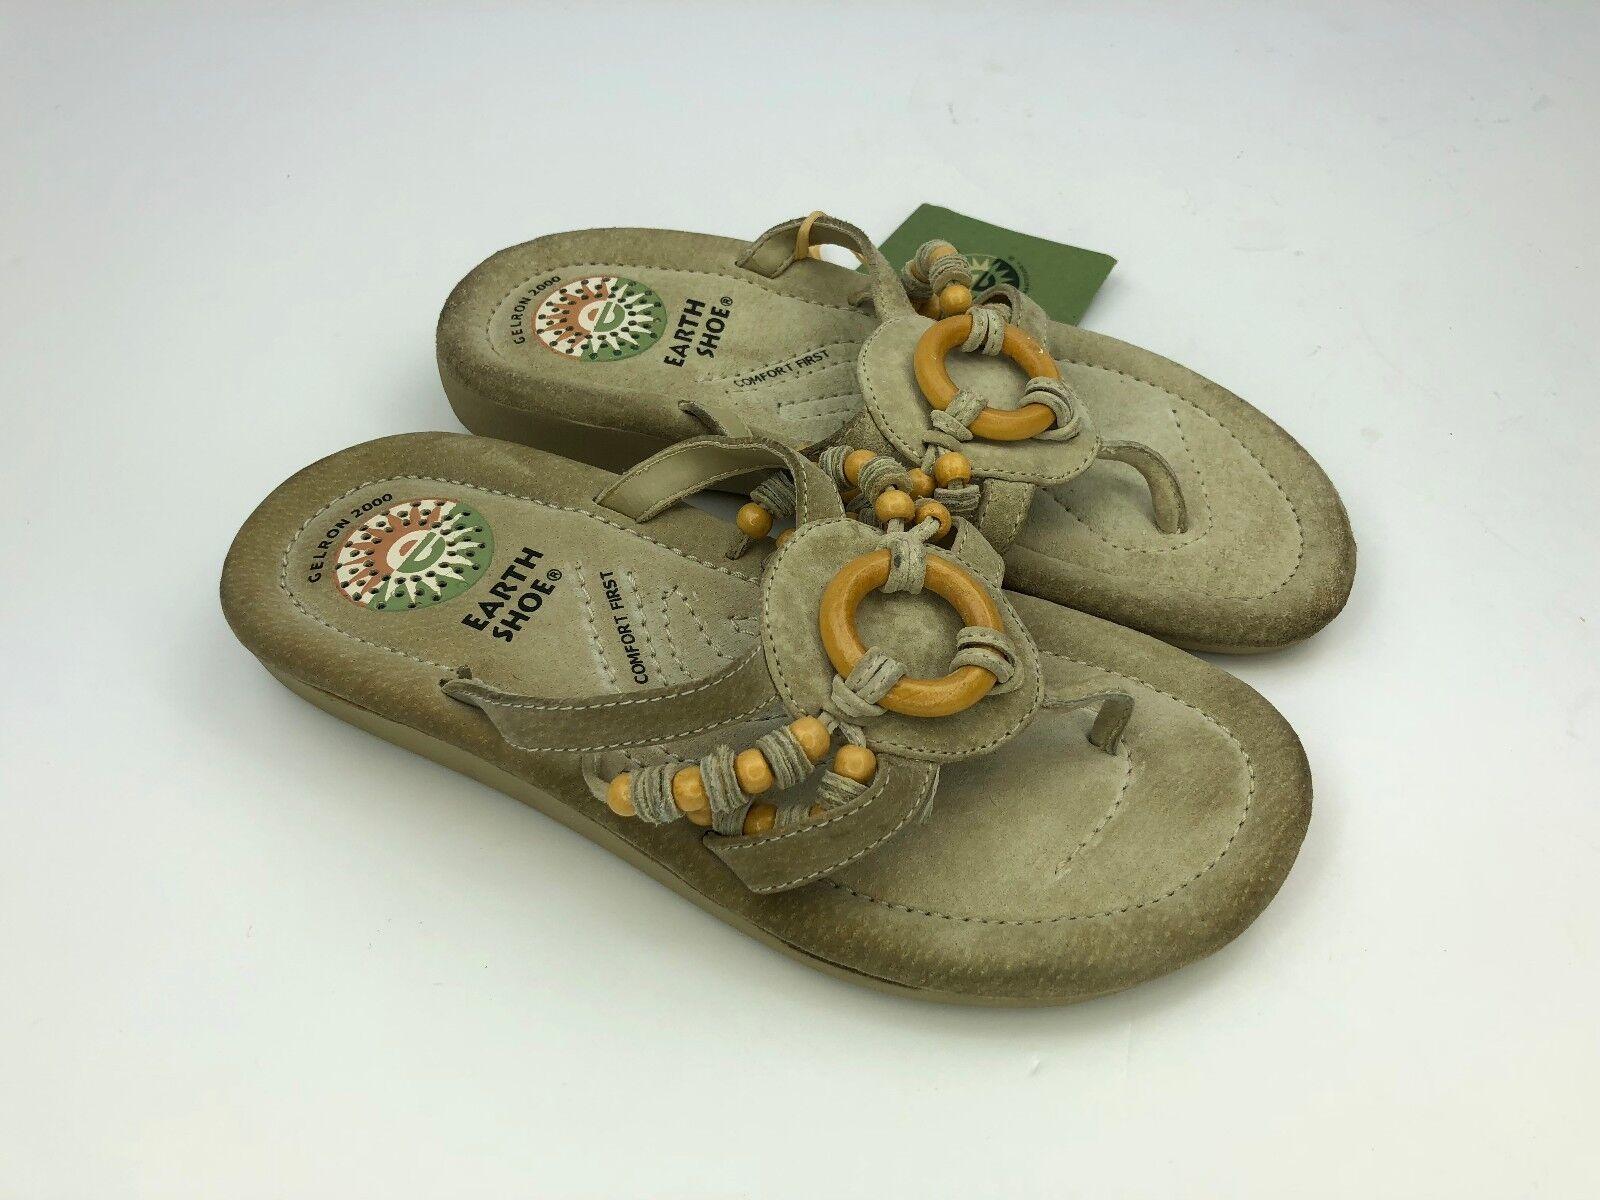 Earth Flip Spirit US Shoes 5.5 Women Leather Suede Sandal Flip Earth Flops Slides Bead G50 77fc2d